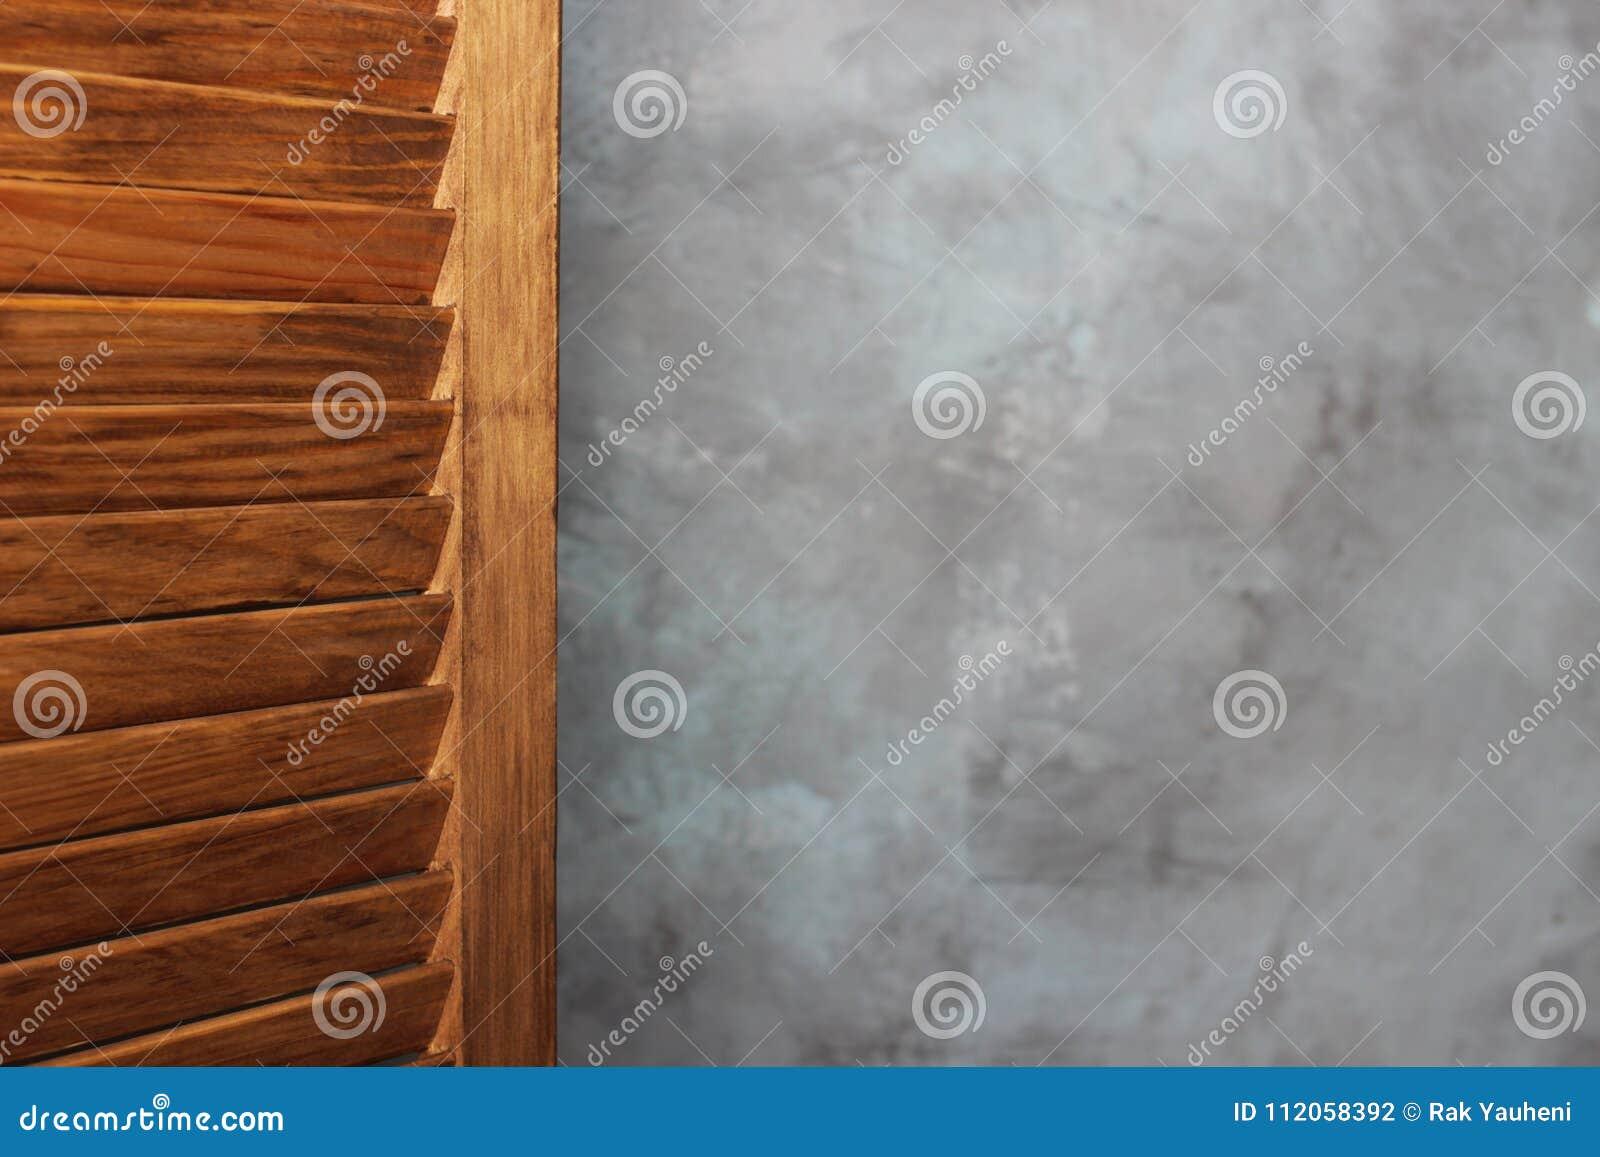 Wooden Screen Door Made Of Wood Folding Screen Stock Photo Image